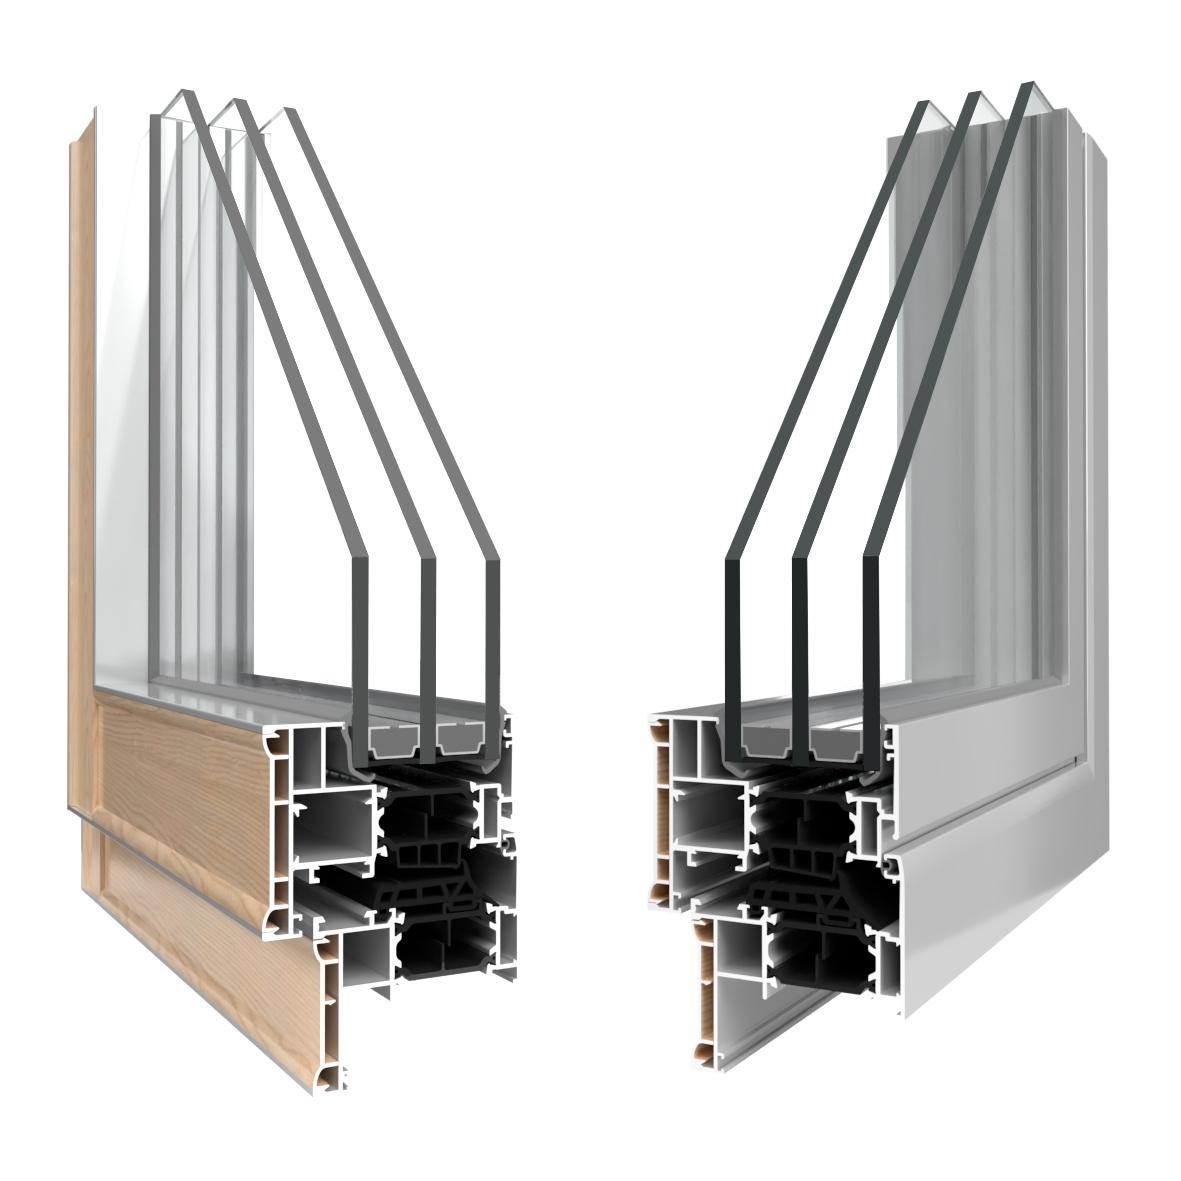 https://www.allpaint.it/wp-content/uploads/2021/07/thermika-line90-alluminio-allpaint.jpg